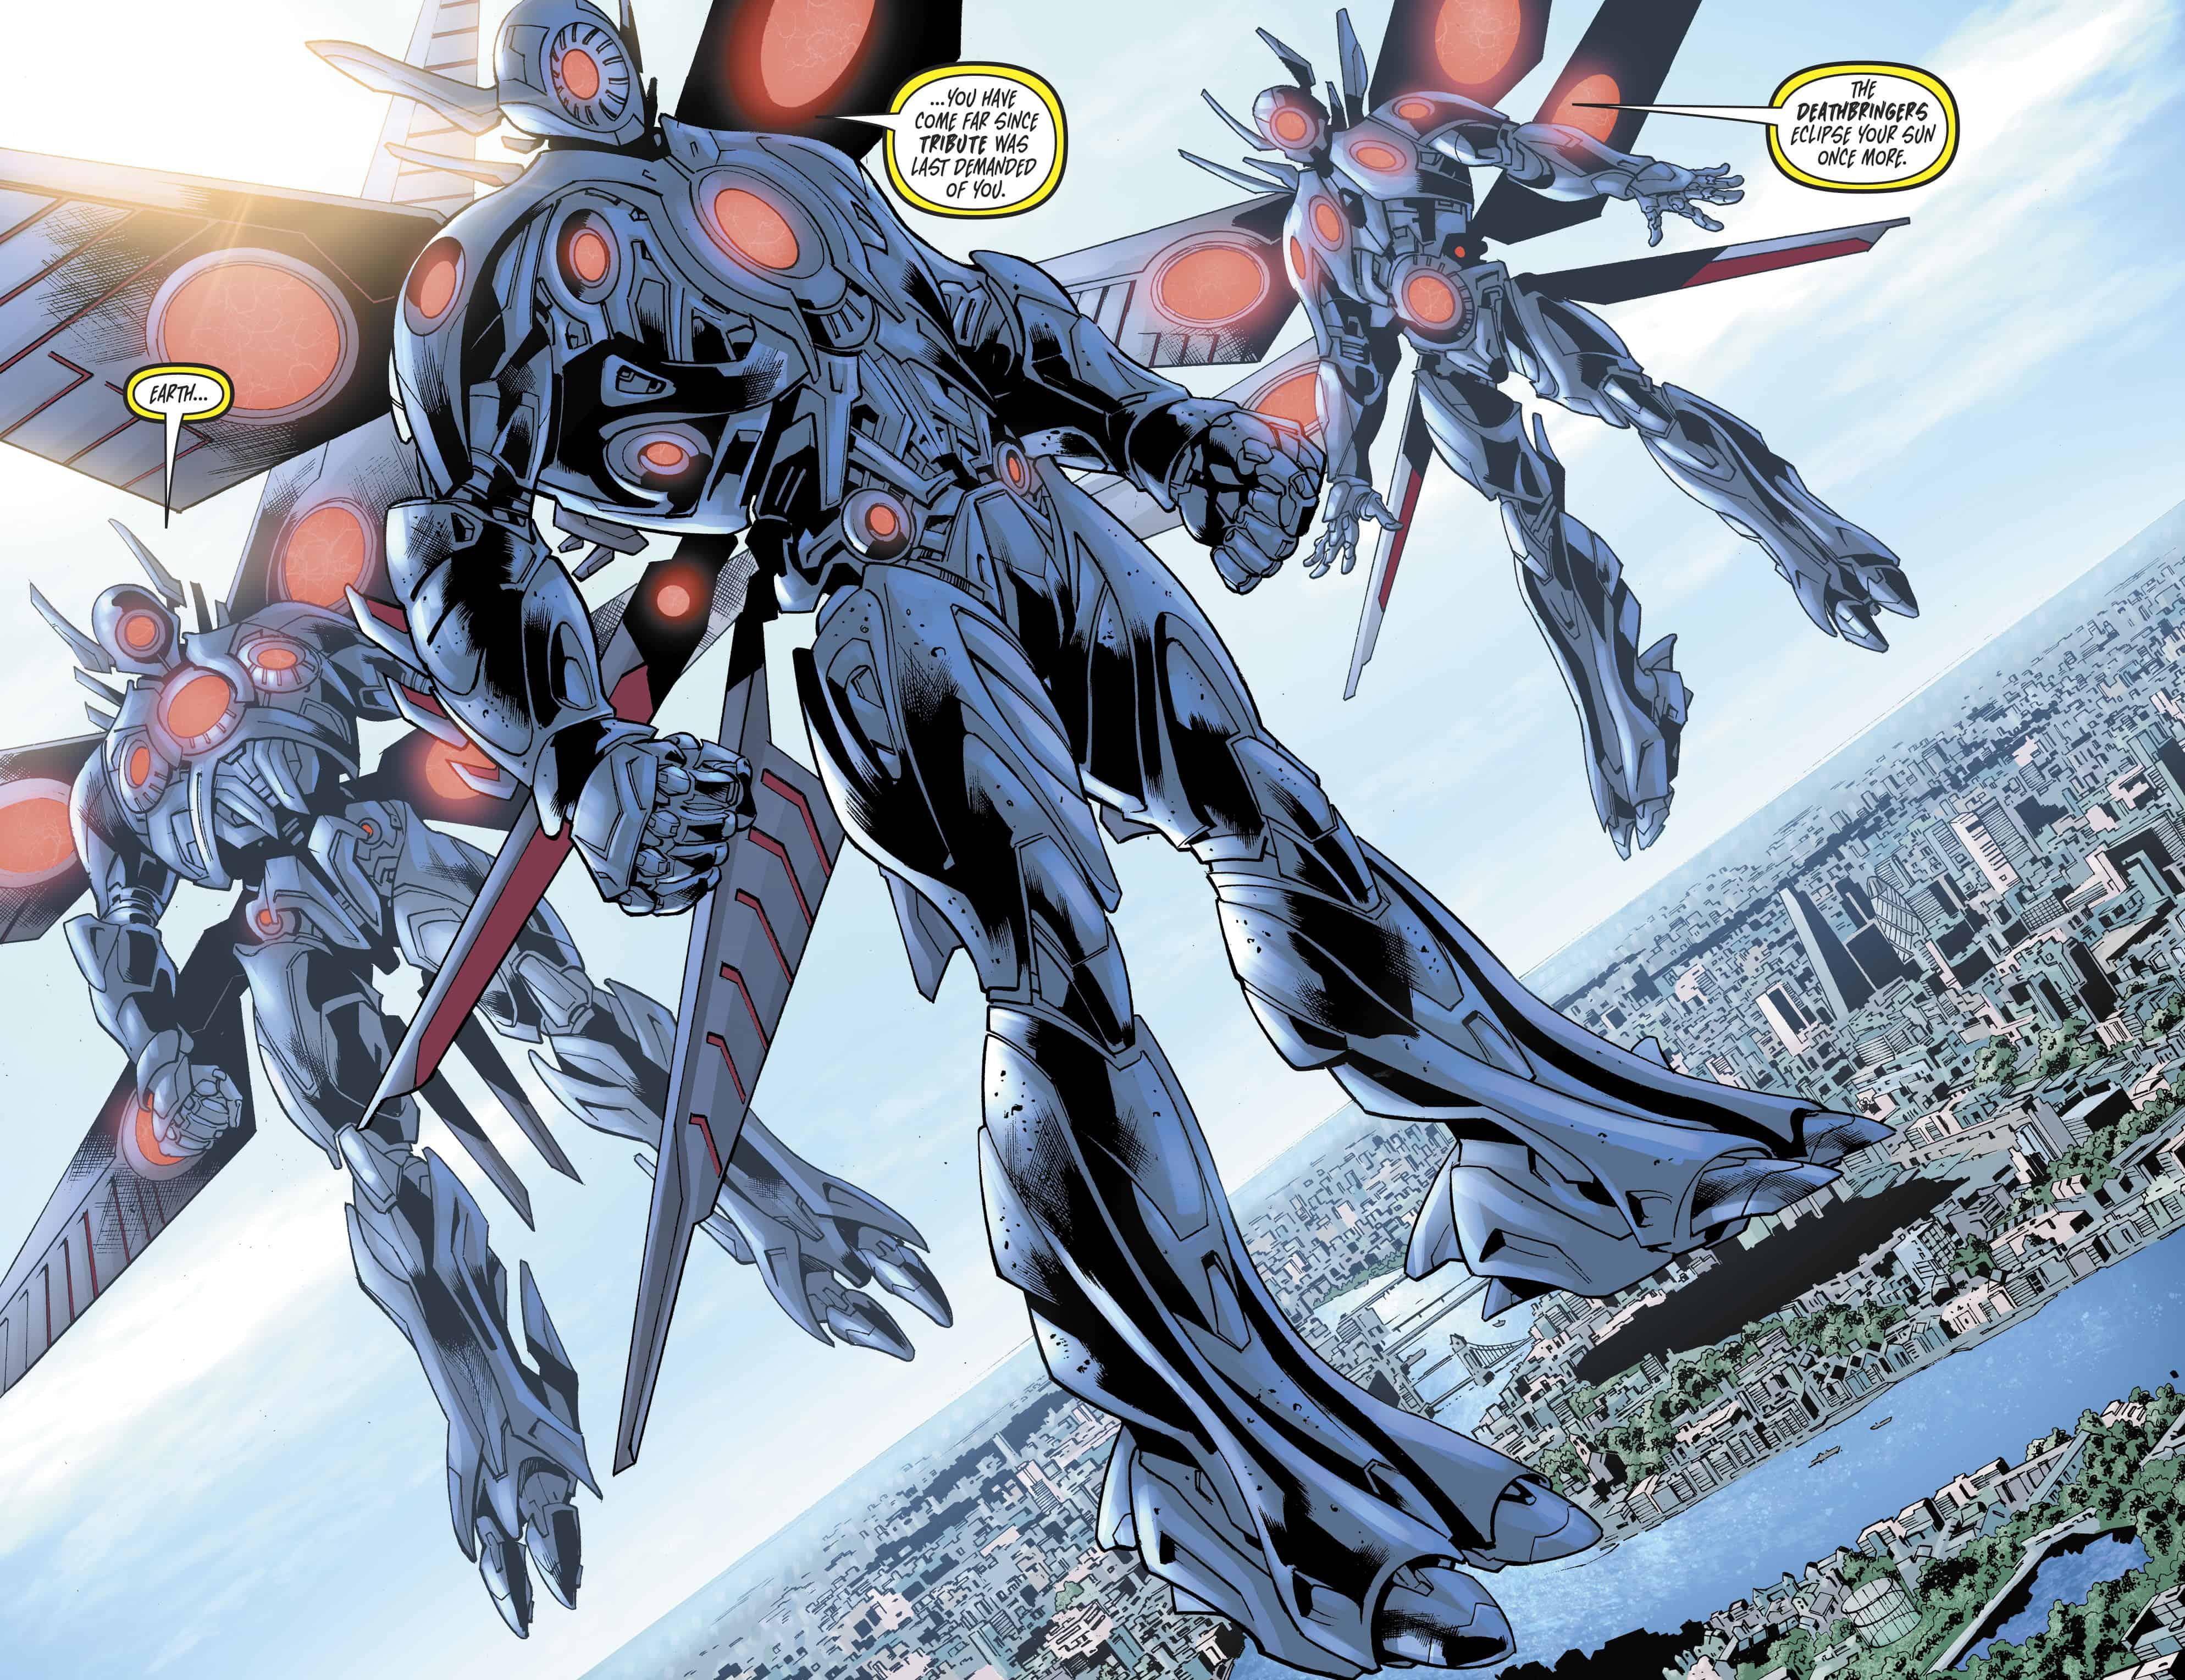 Confrontation [Atom] Hawkman-9-deathbringers-arrive